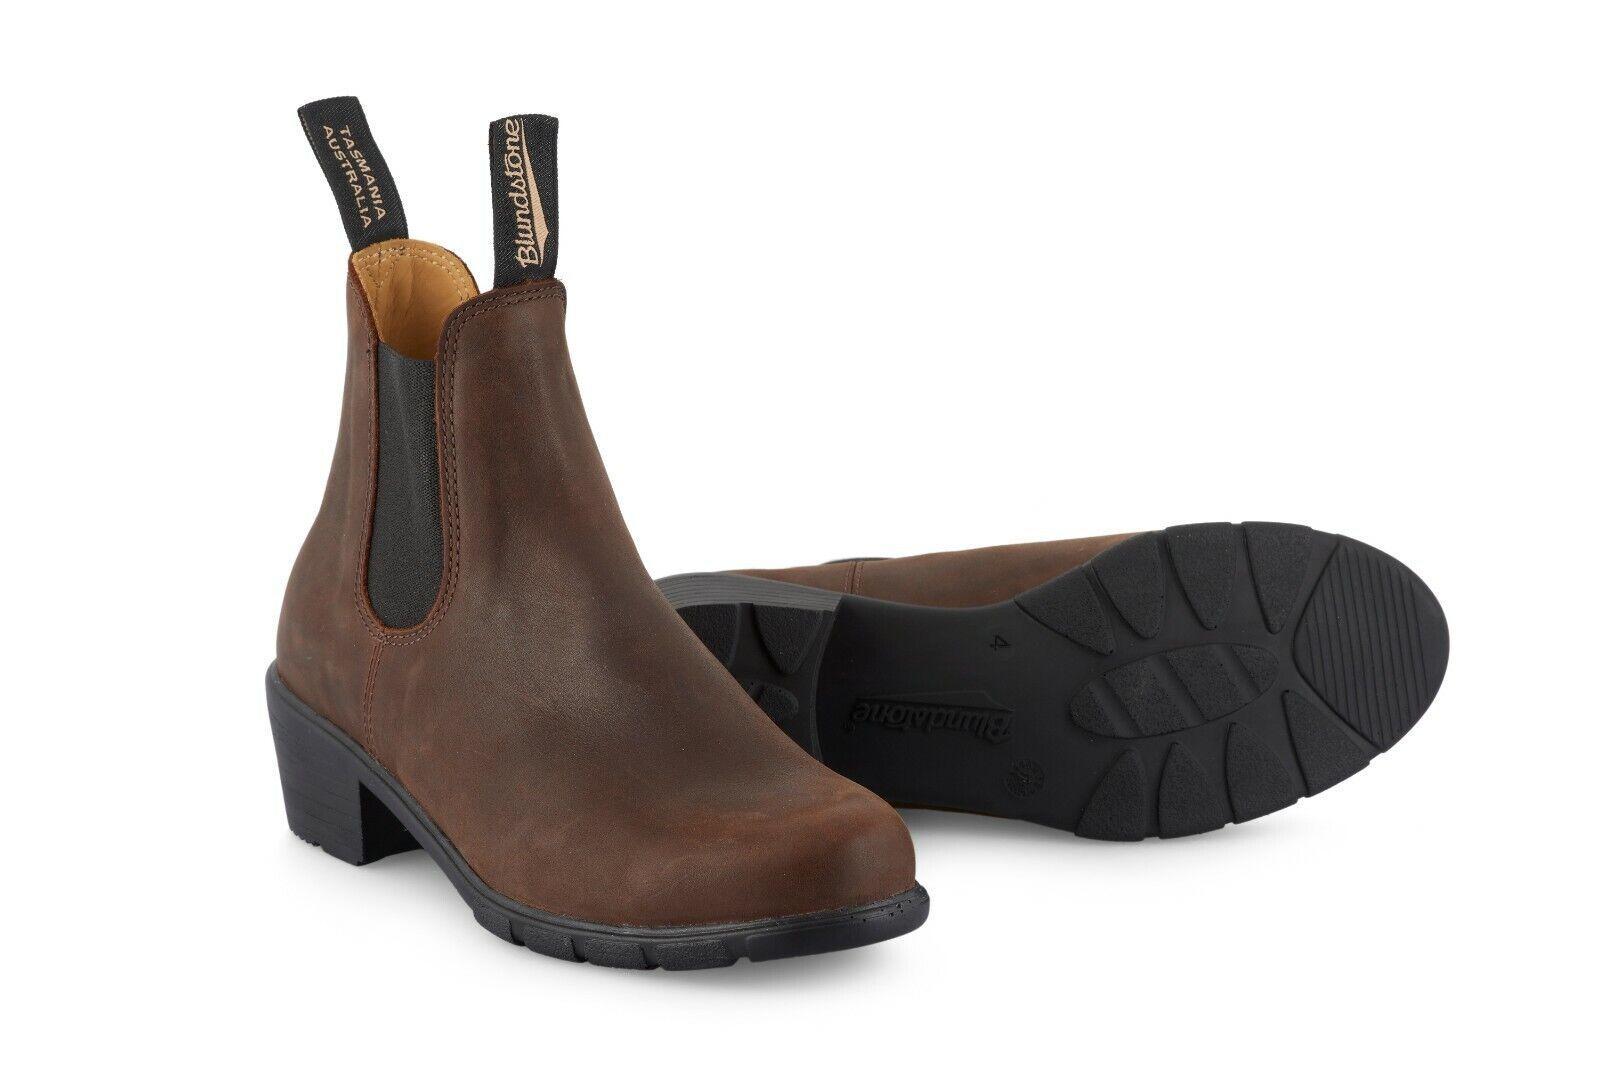 vendita online Ladies Blundstone 1673 Antique Marrone Leather Chelsea Dress Heeled Heeled Heeled Ankle avvio  distribuzione globale